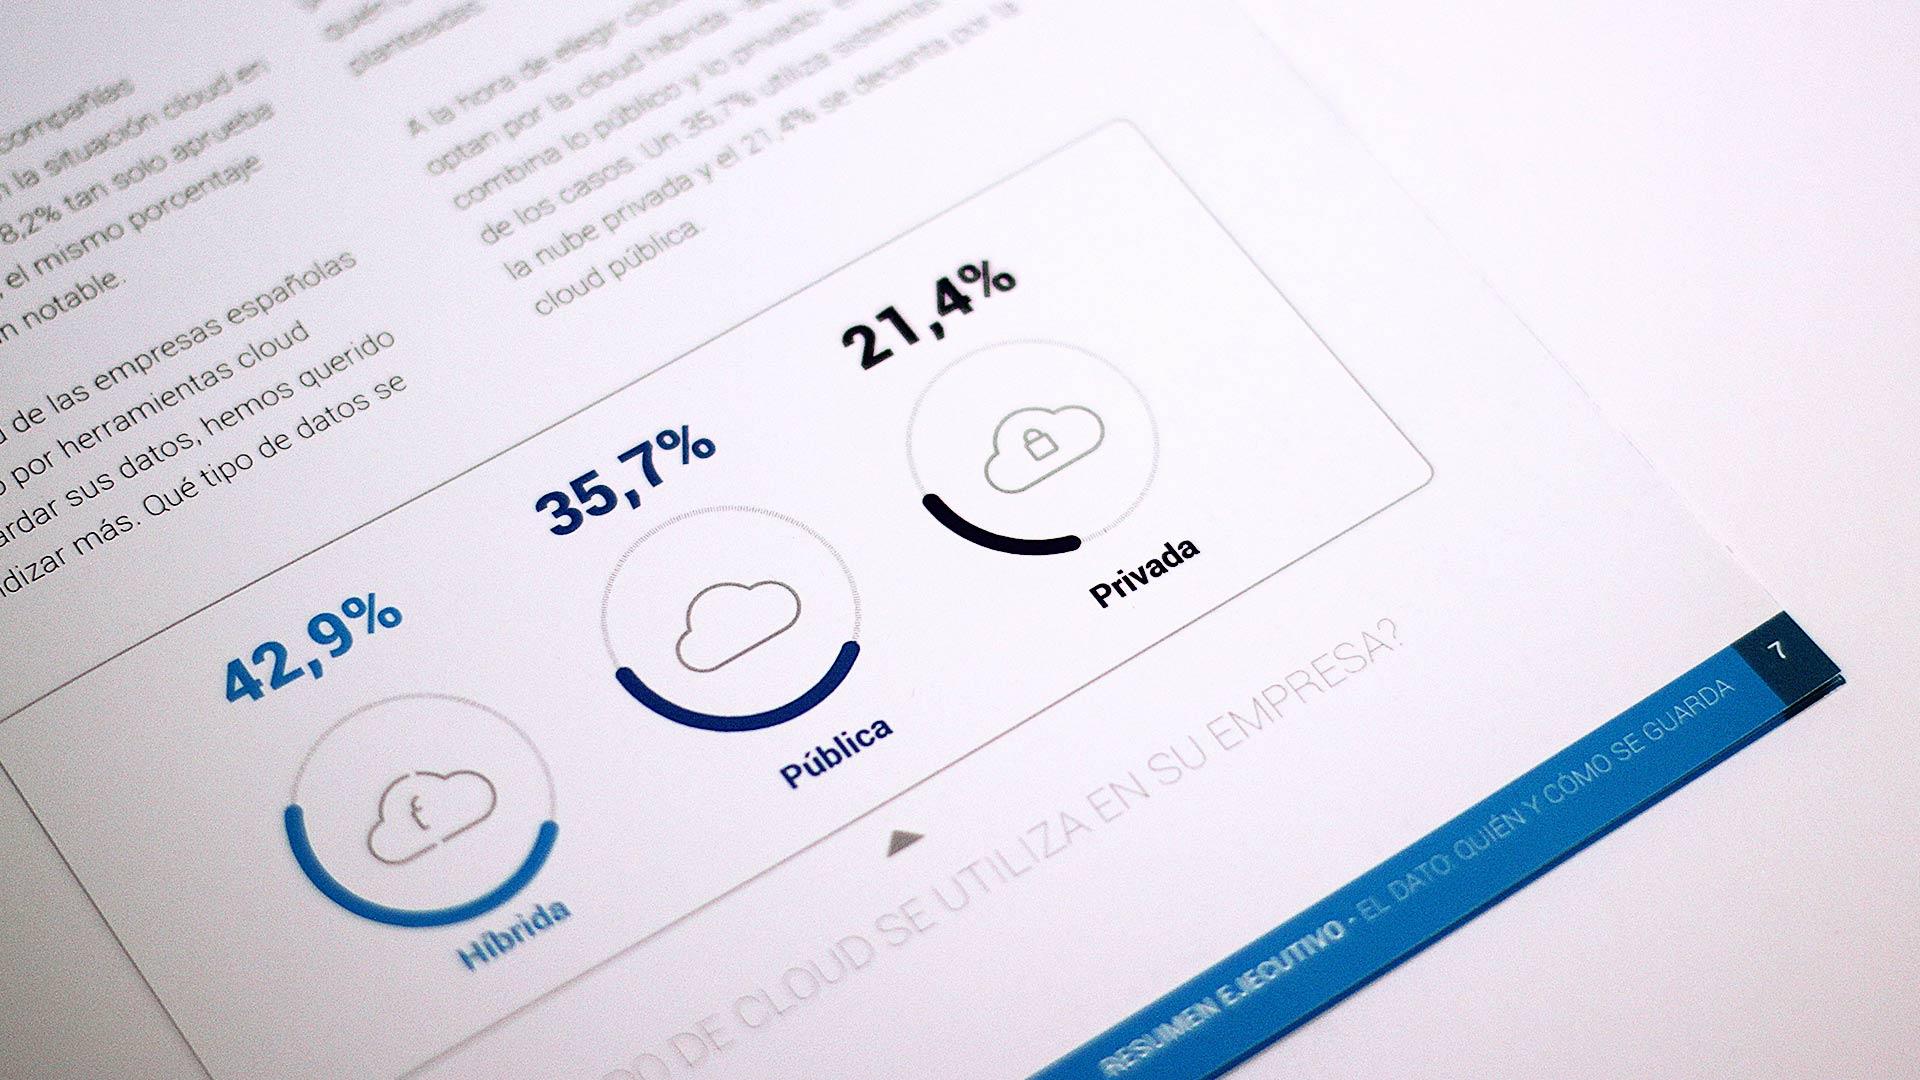 netapp-mediacloud-content-marketing-informe-resumen-ejecutivo-ebook-2017-15